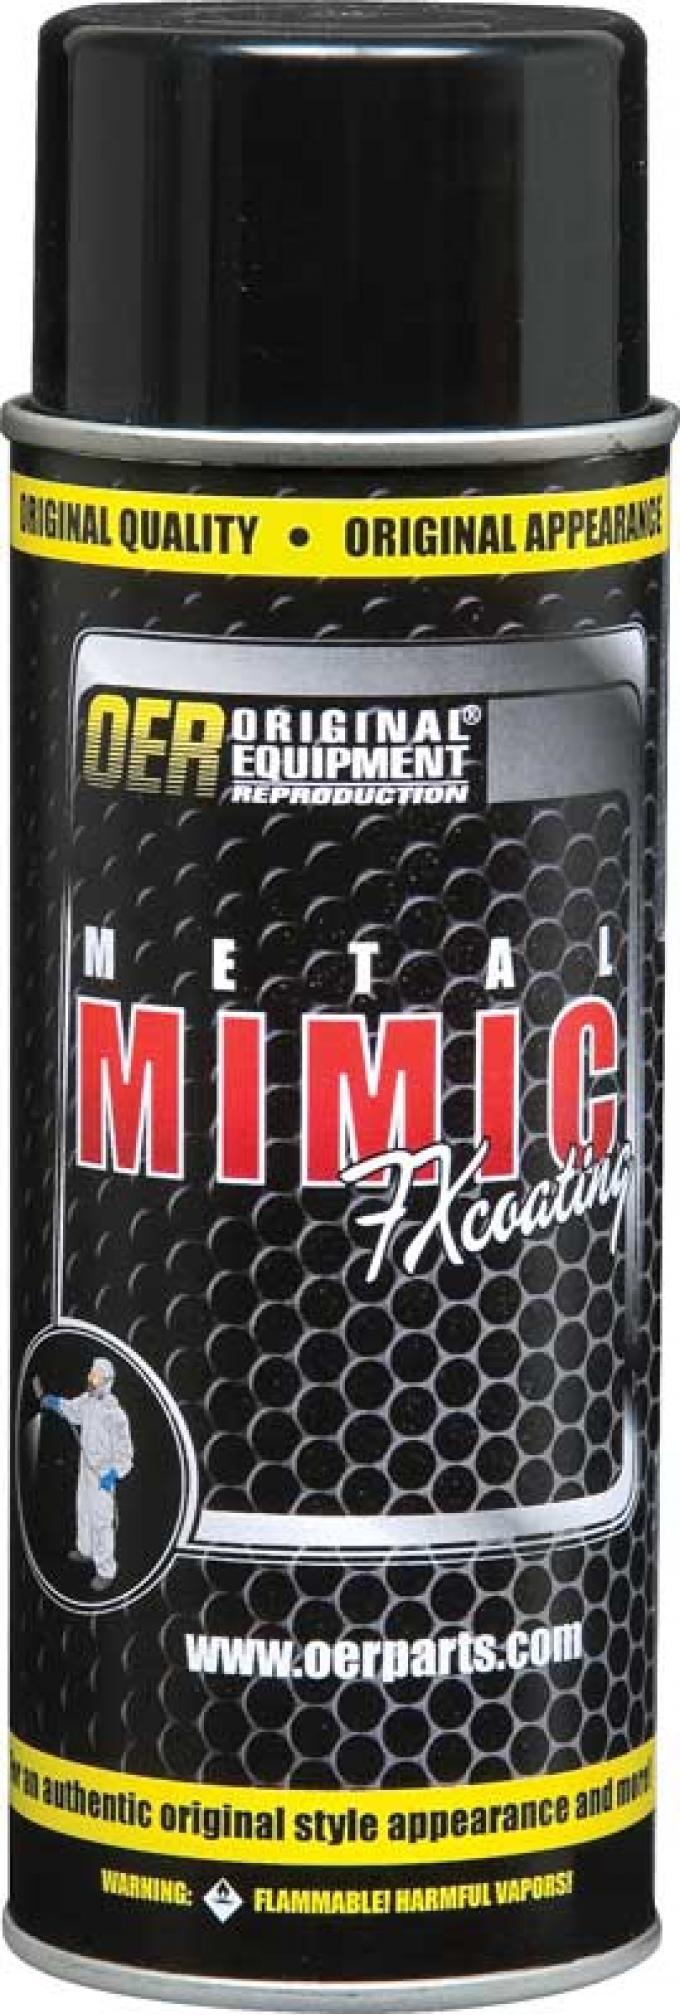 OER Metel Mimic FX Galvanized Zinc Blast Paint 16 Oz Aerosol Can K89501